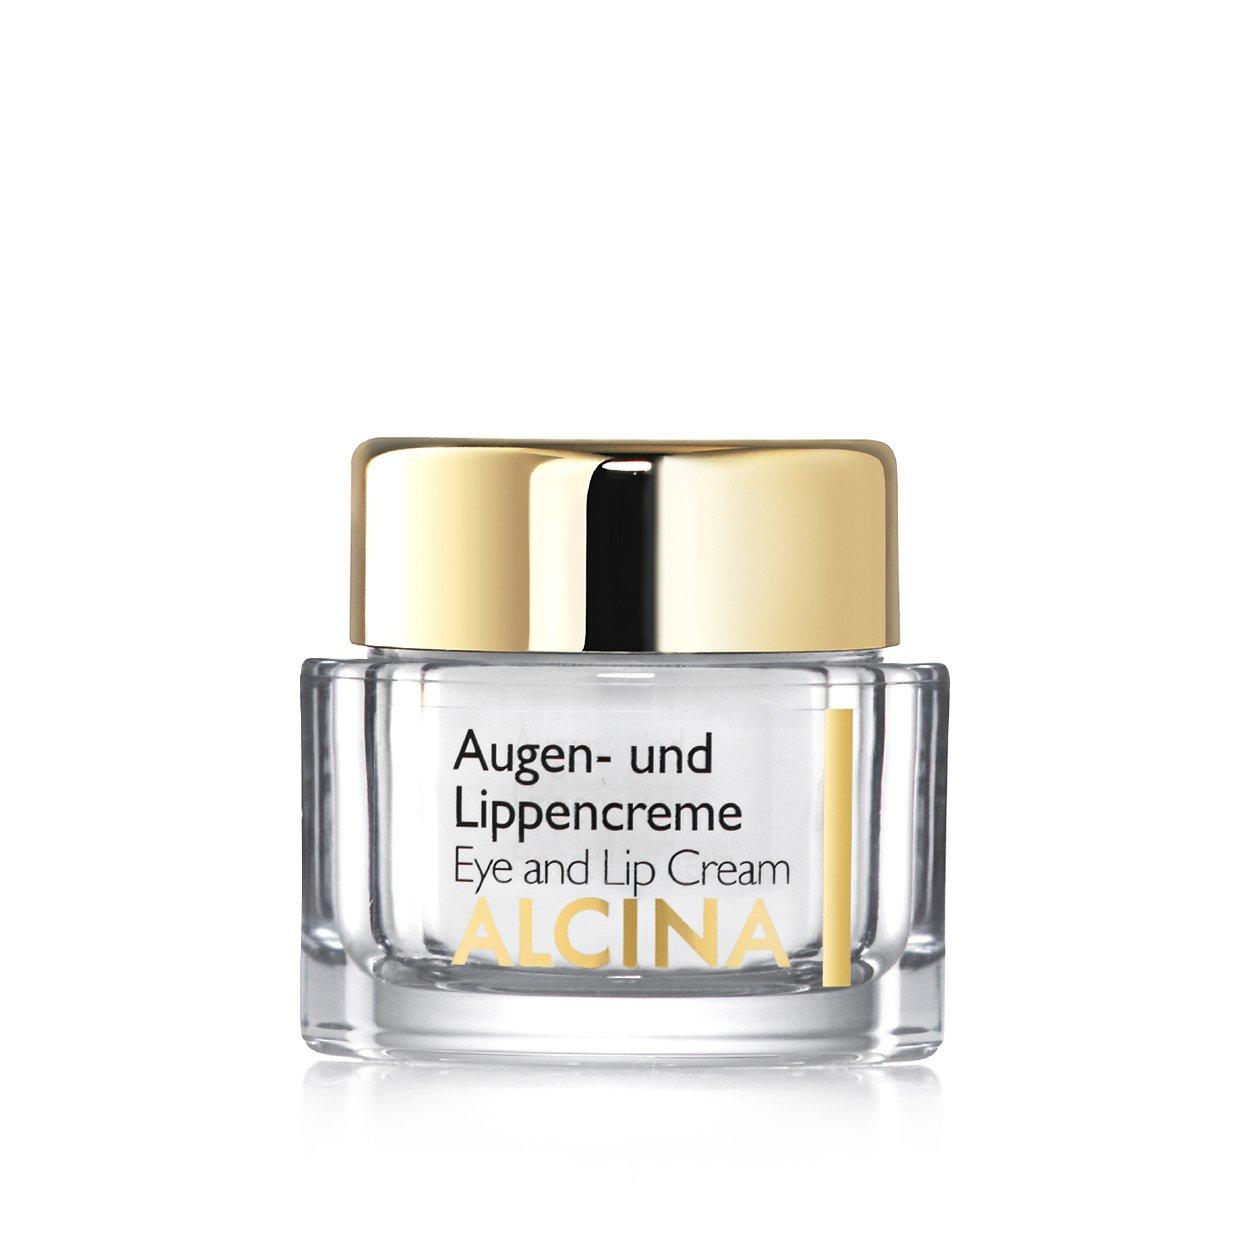 Alcina eye and lip cream 15 ml